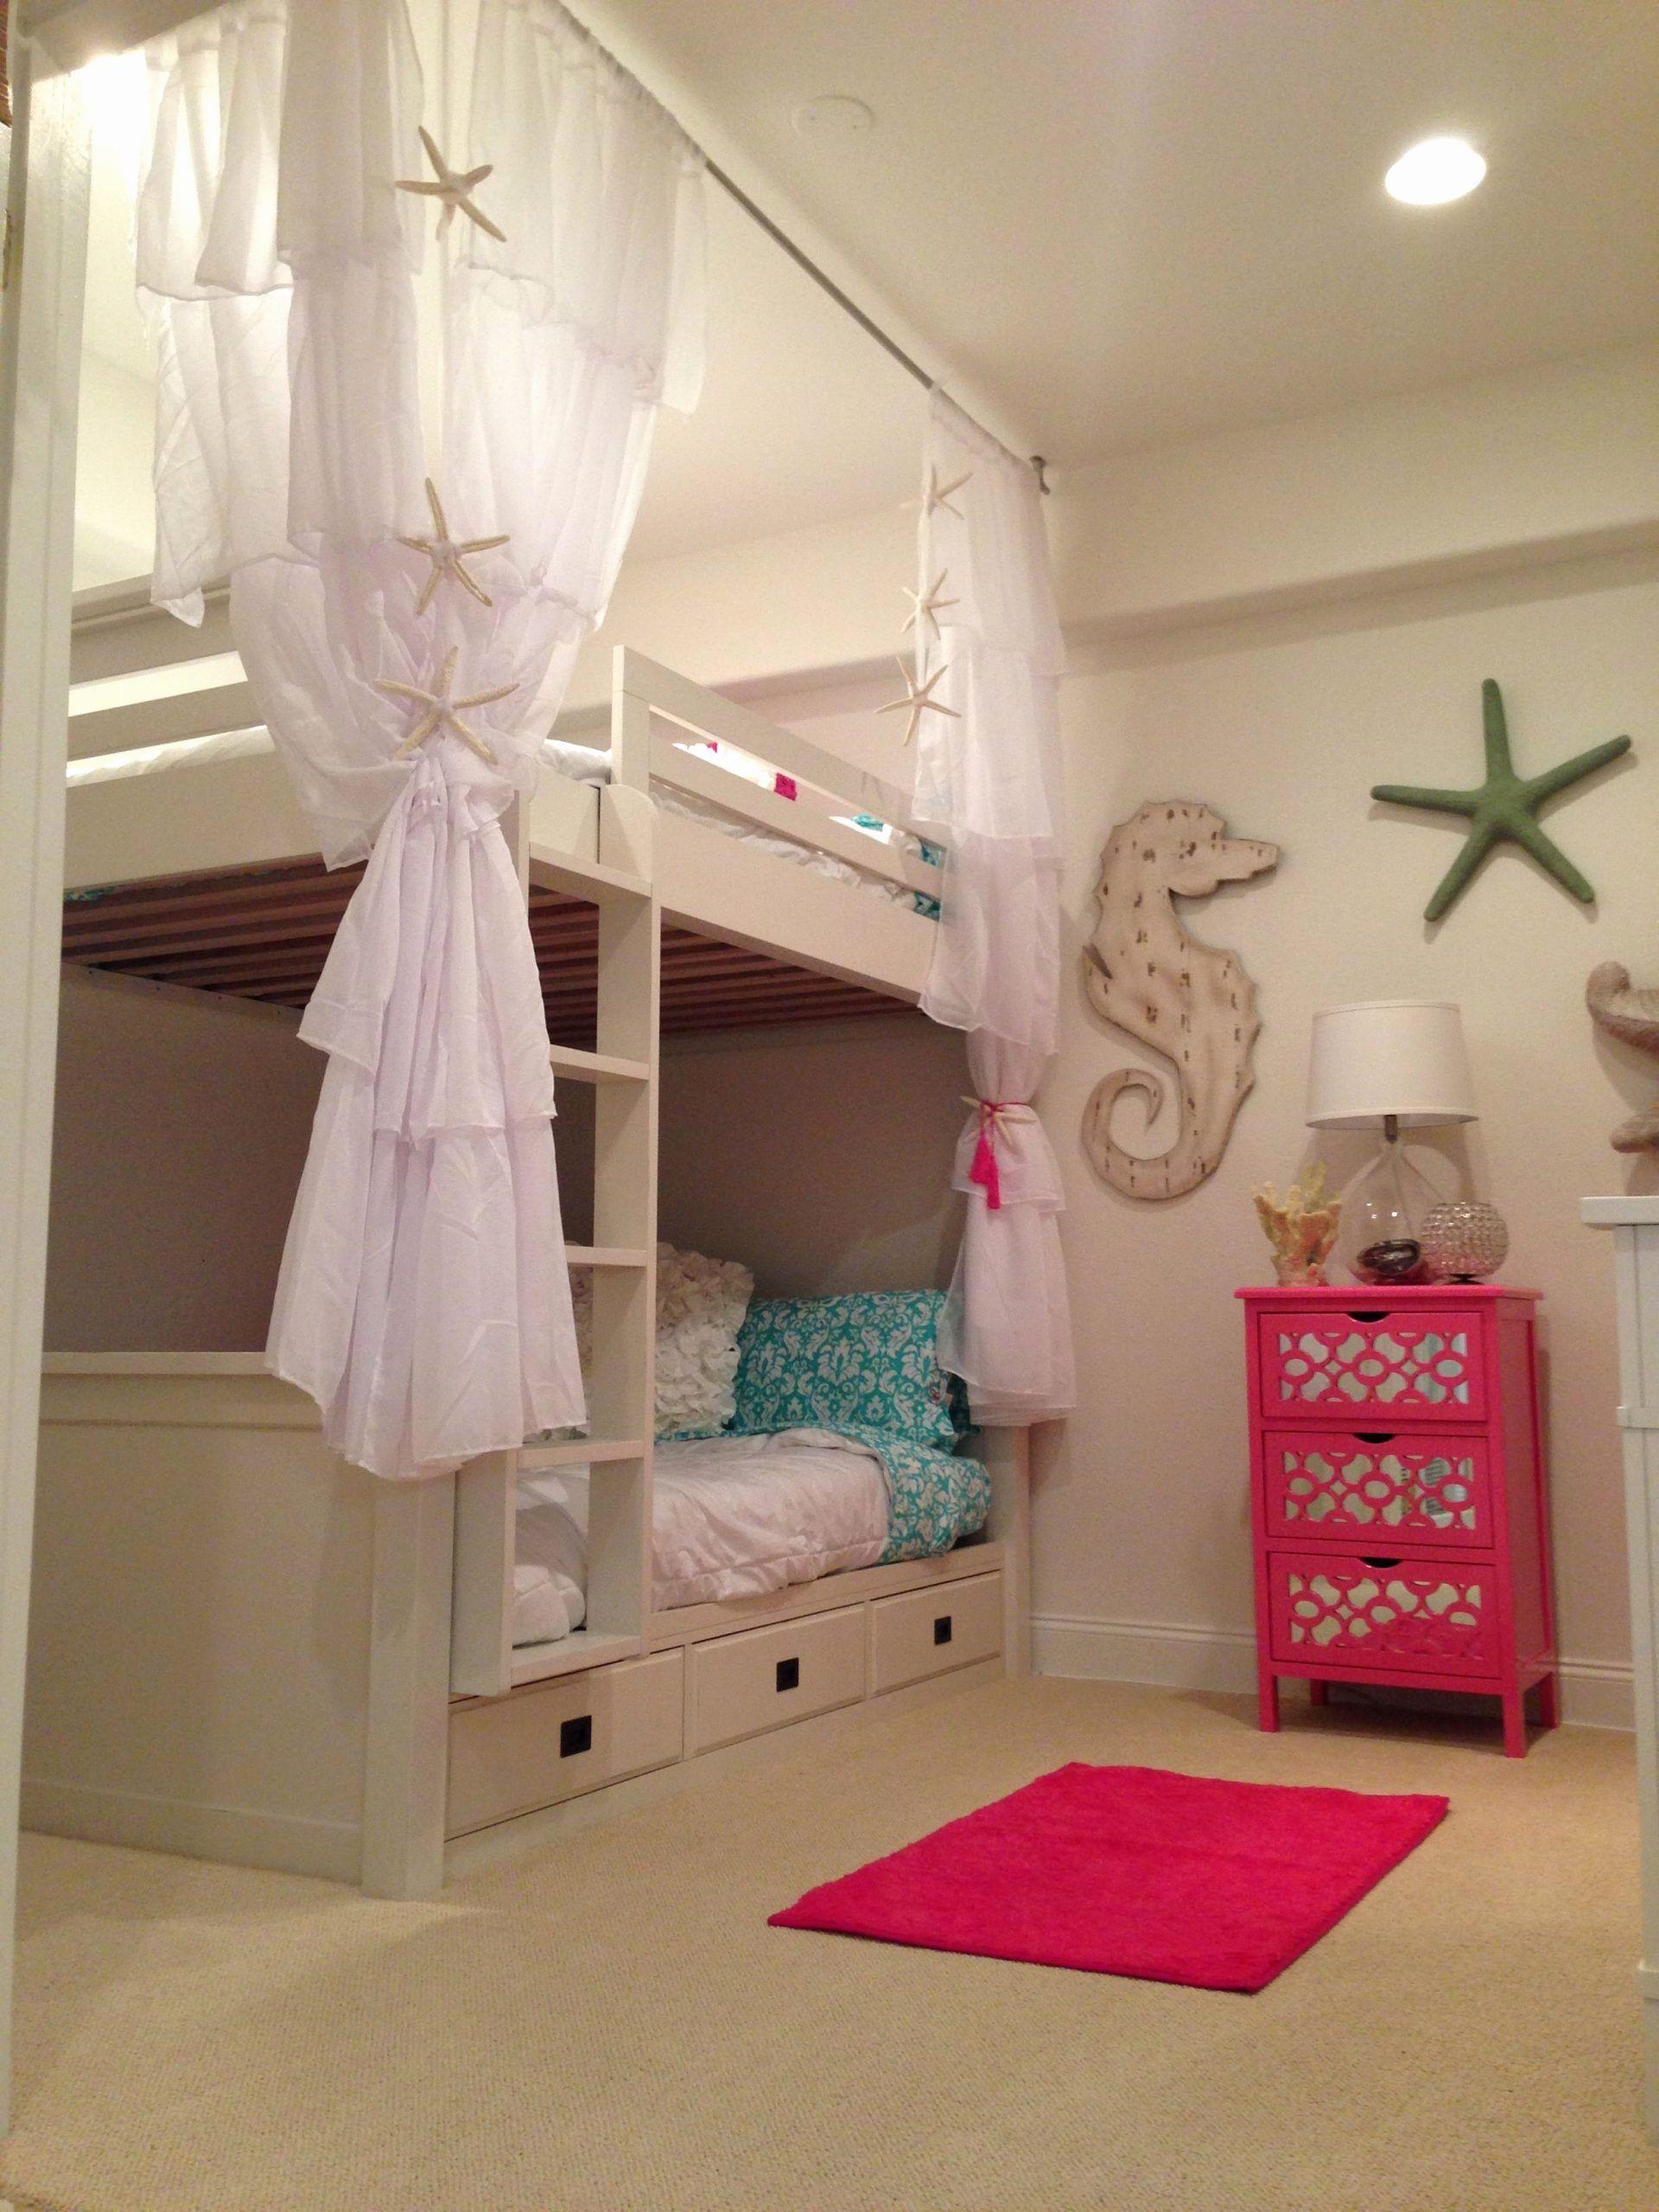 Beach Themed Bedroom Teenage Girl Best Of Girls Beach Bedroom In 2020 Beach Themed Bedroom Girl Room Beach Bedroom